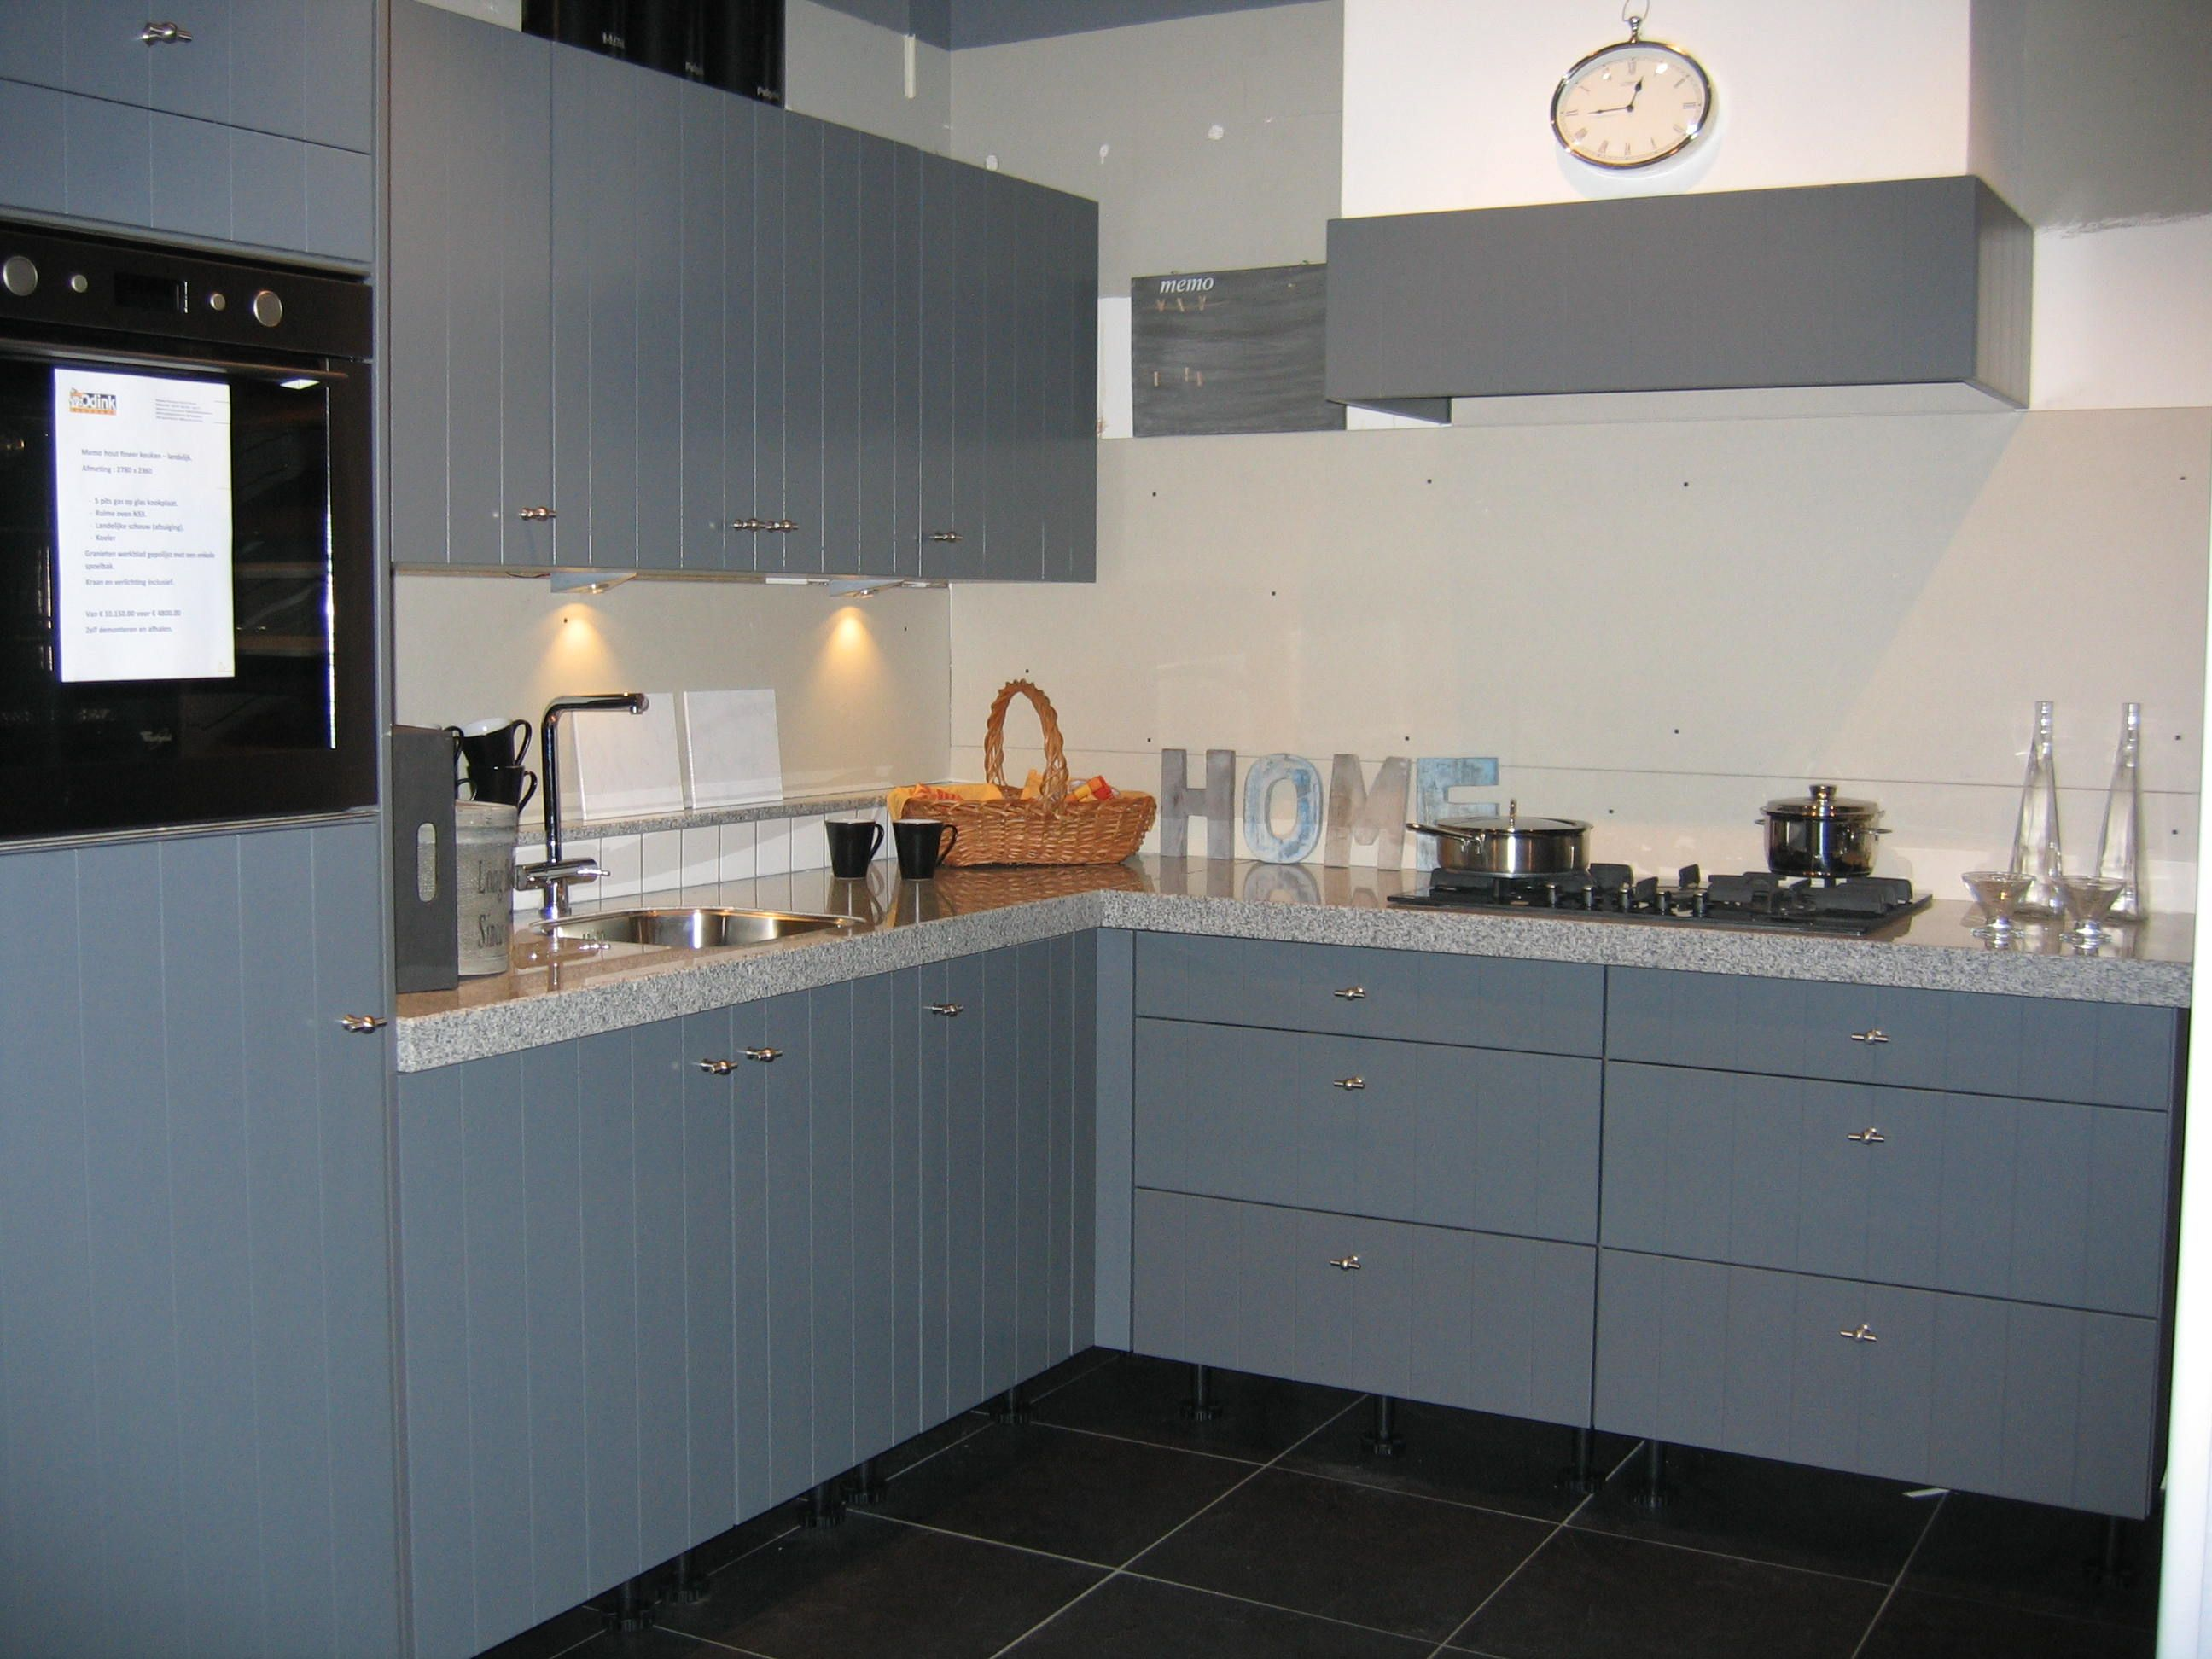 Scandinavisch houten keuken home design idee n en meubilair inspiraties - Meubilair outdoor houten keuken ...